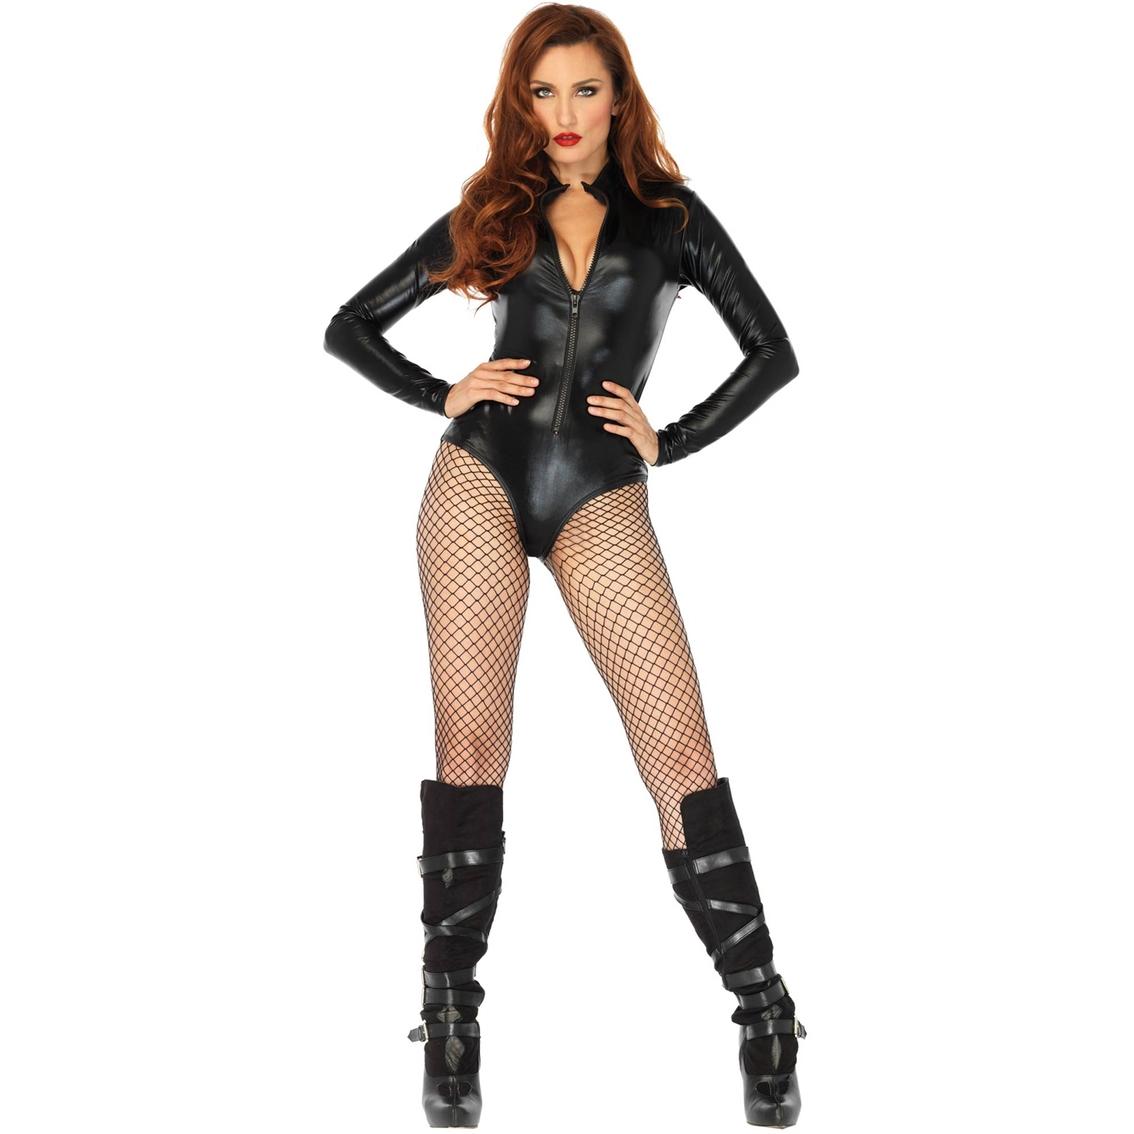 711b34d2441da Leg Avenue Women's Wet Look High Neck Bodysuit | Women's Costumes ...